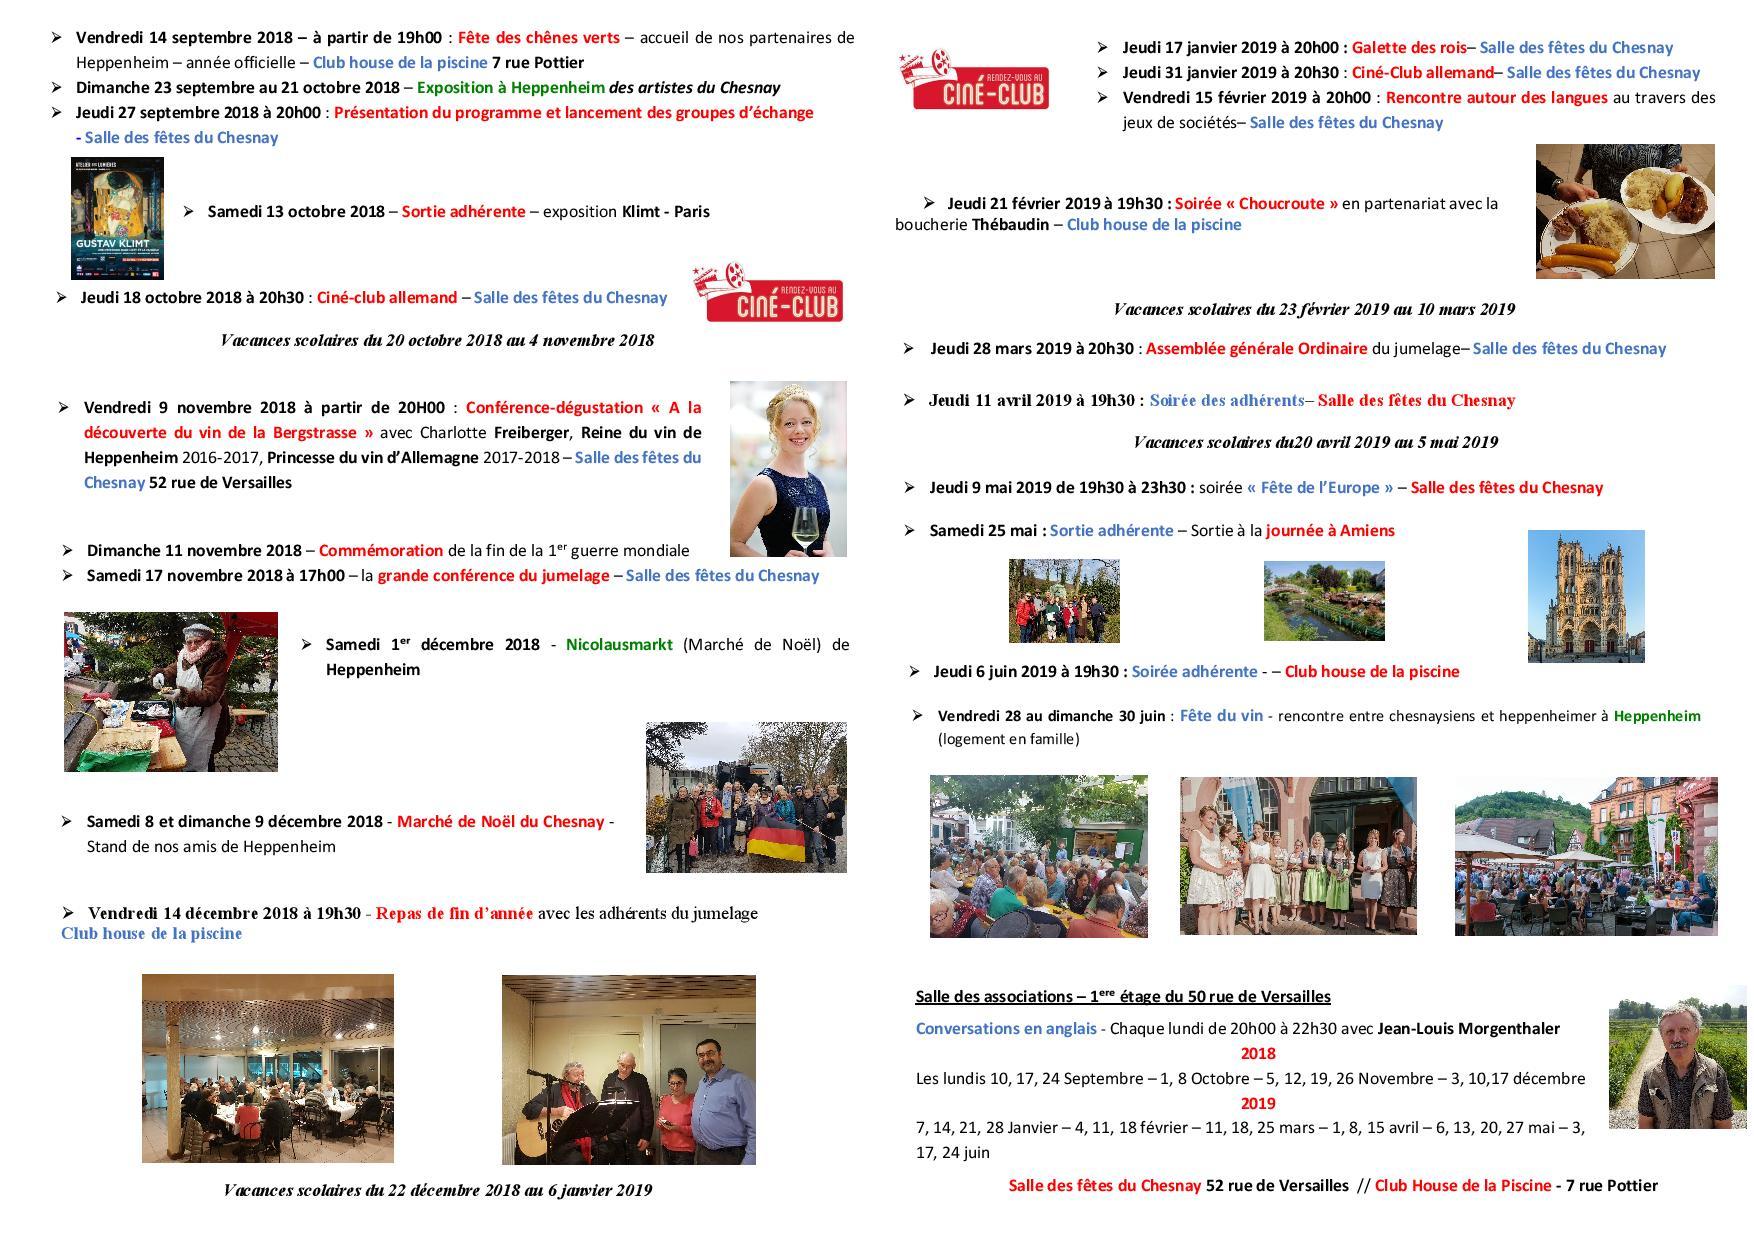 Site de rencontres allemand en anglais